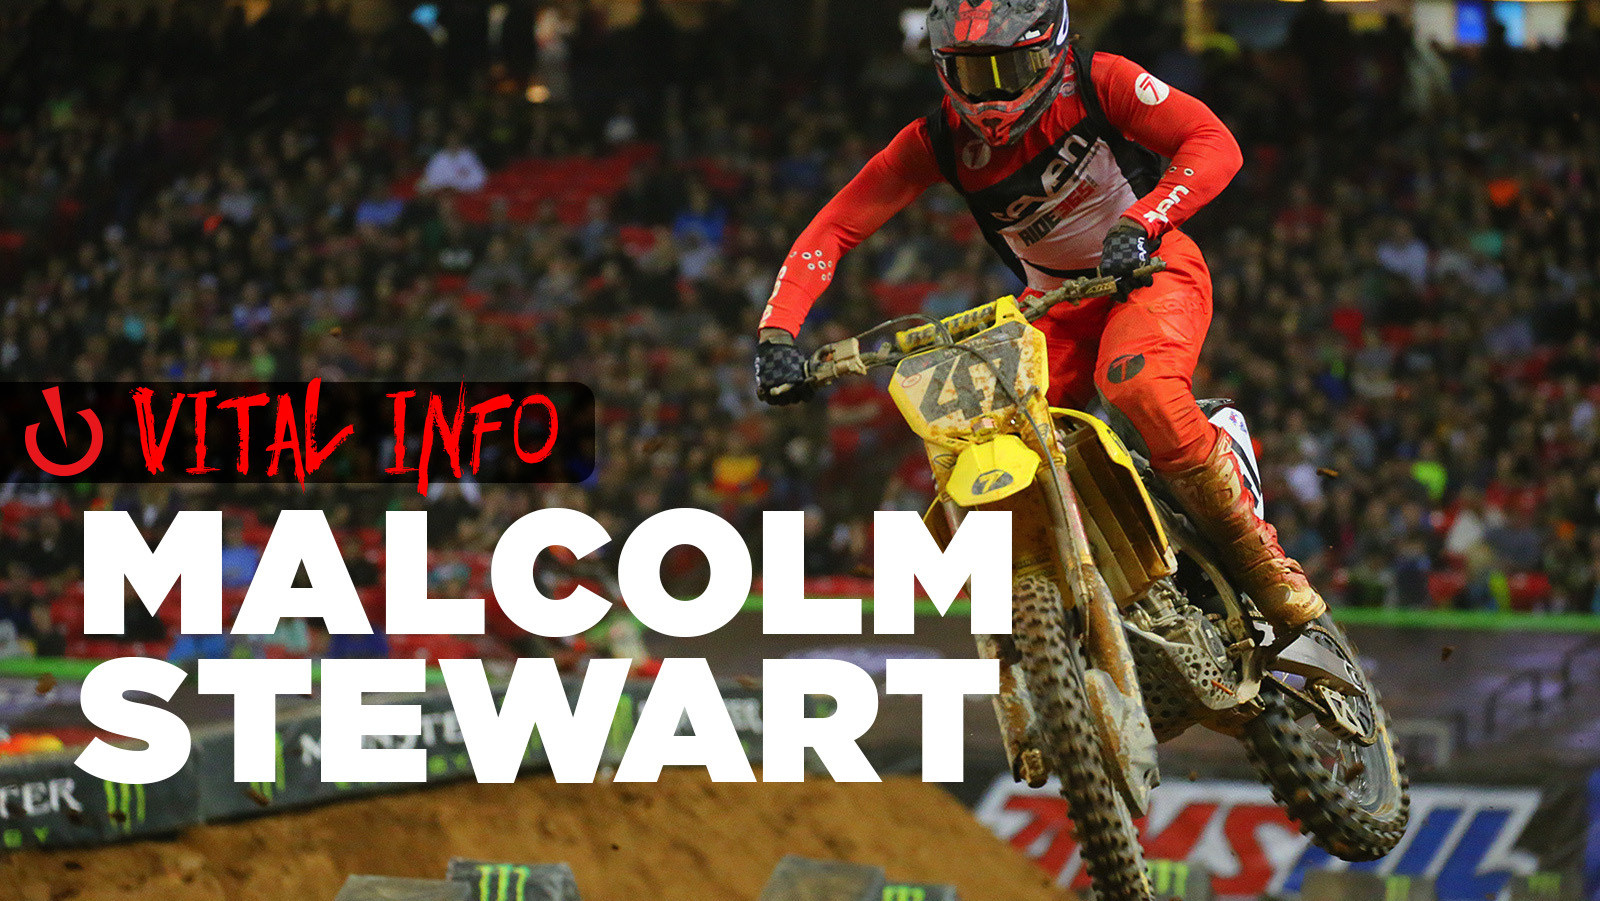 Vital Info: Malcolm Stewart